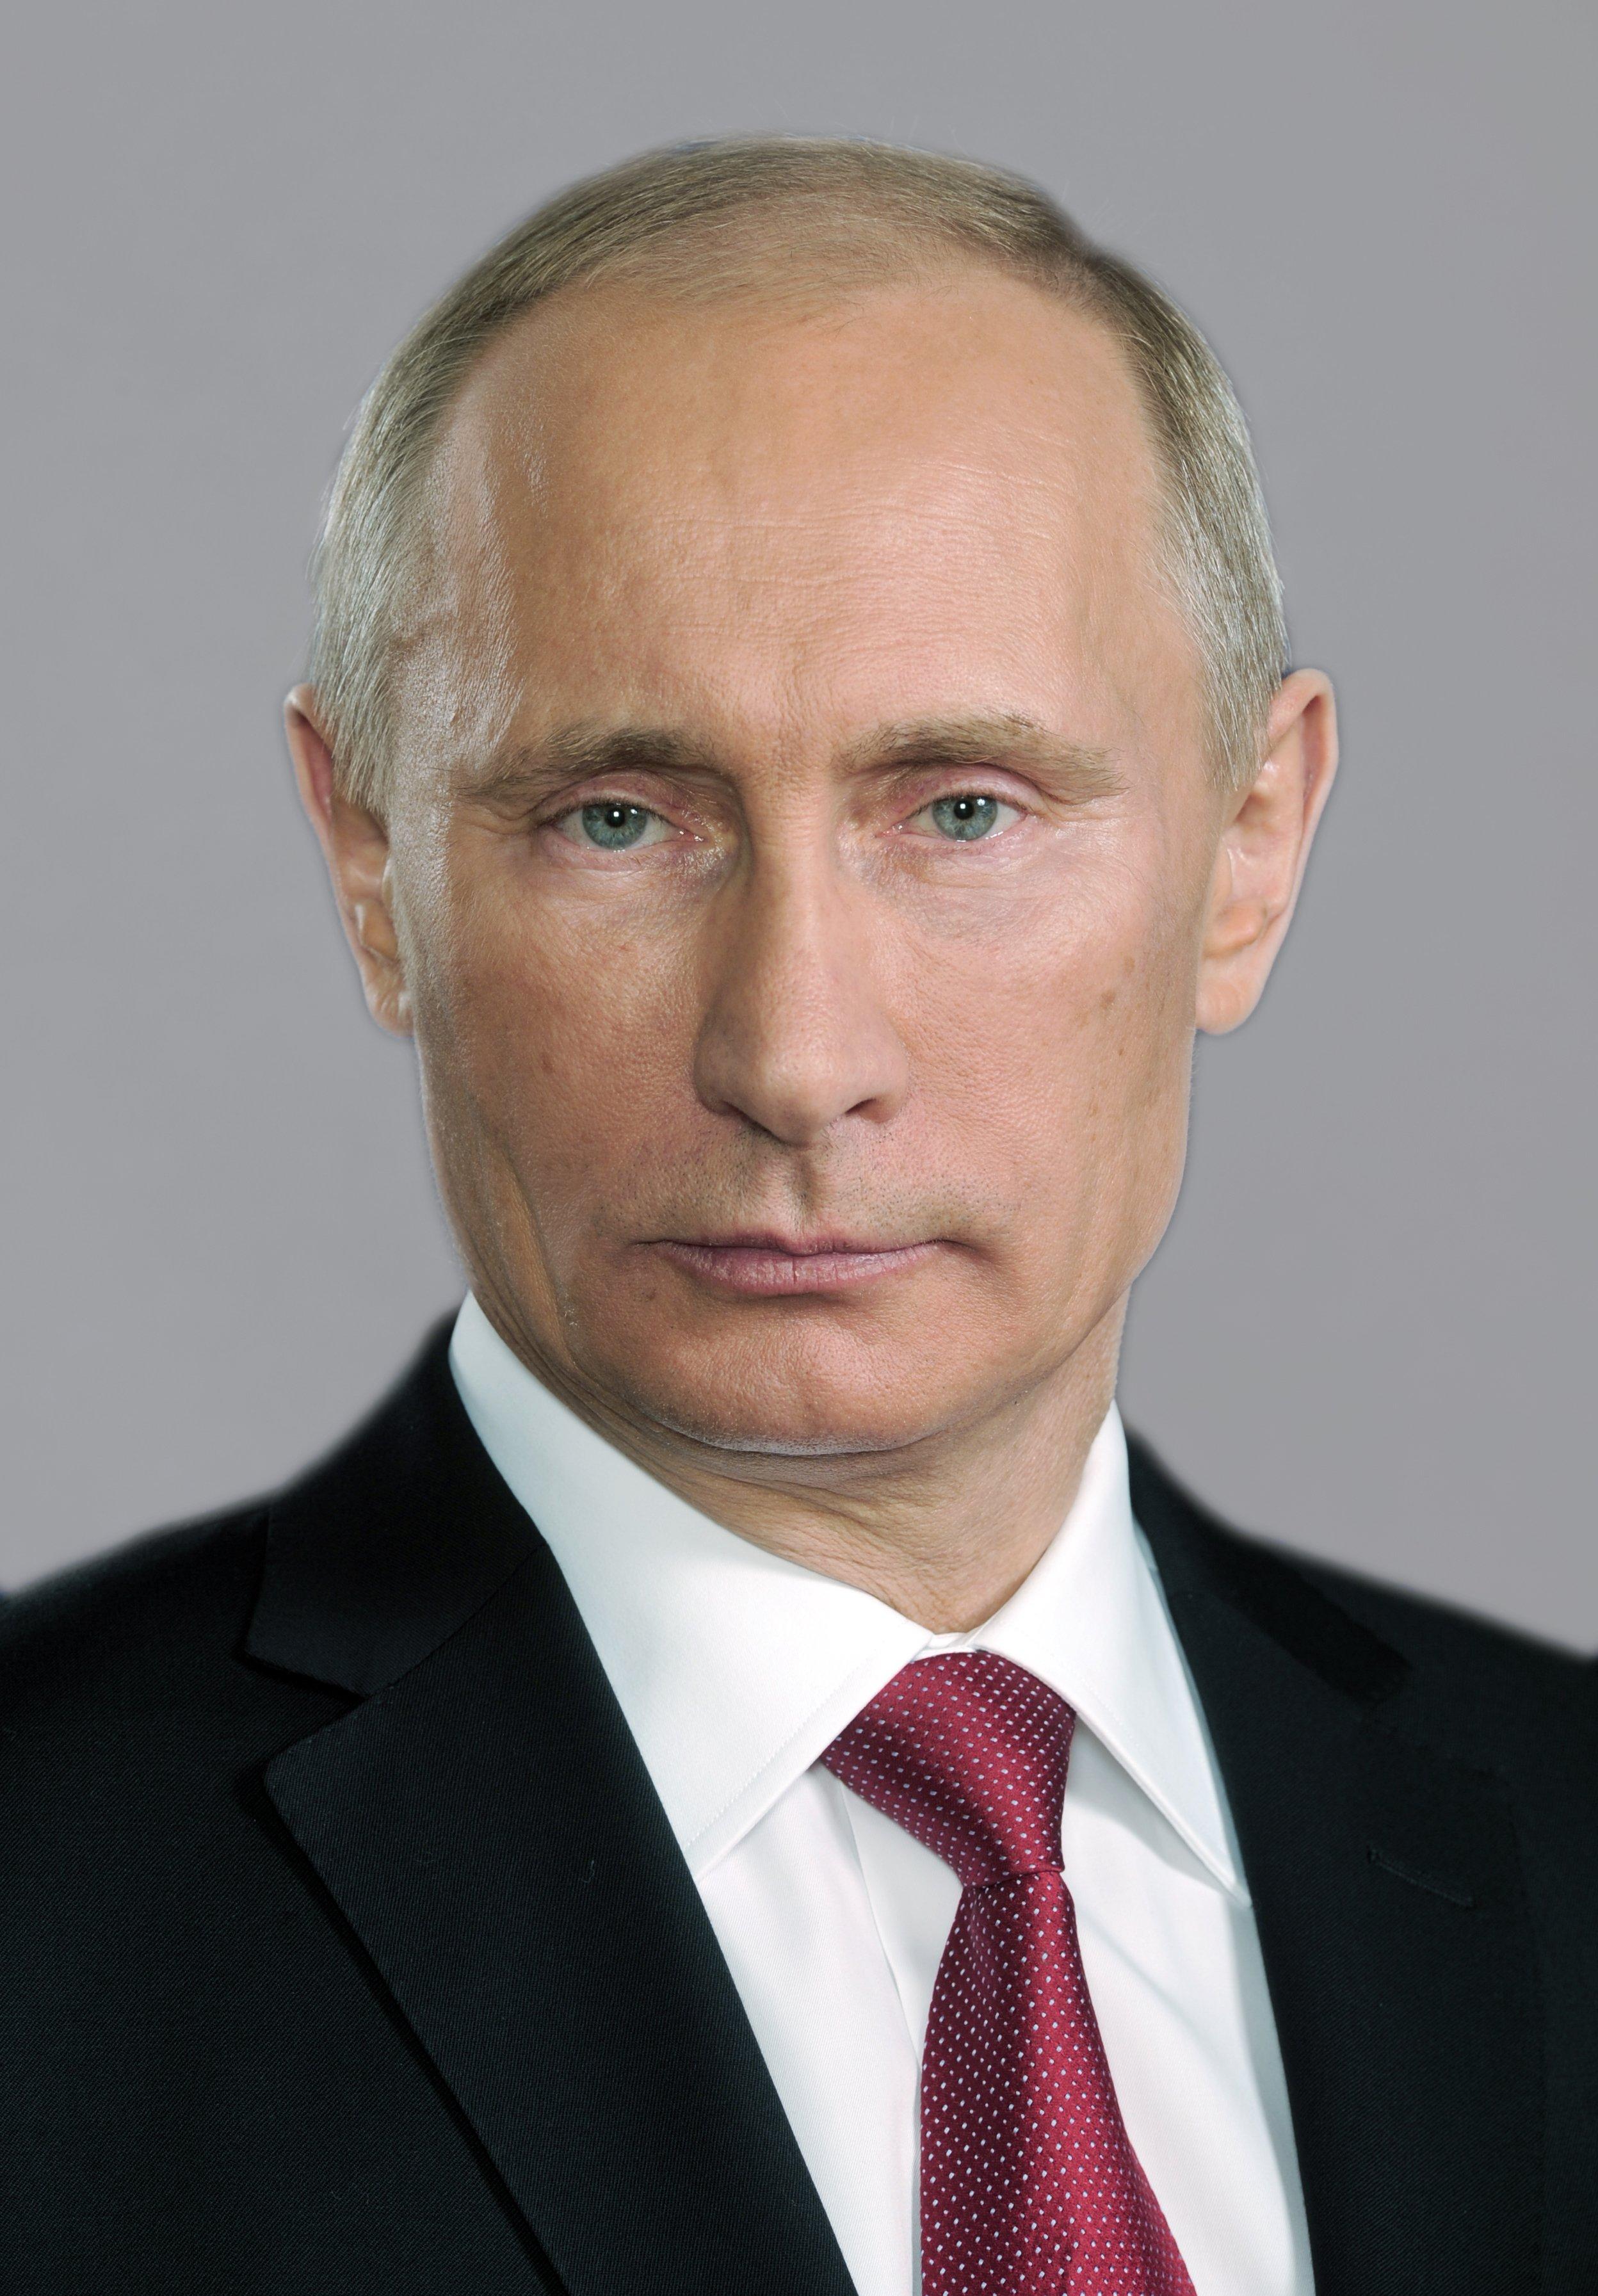 Vladimir_Putin_2006.jpg